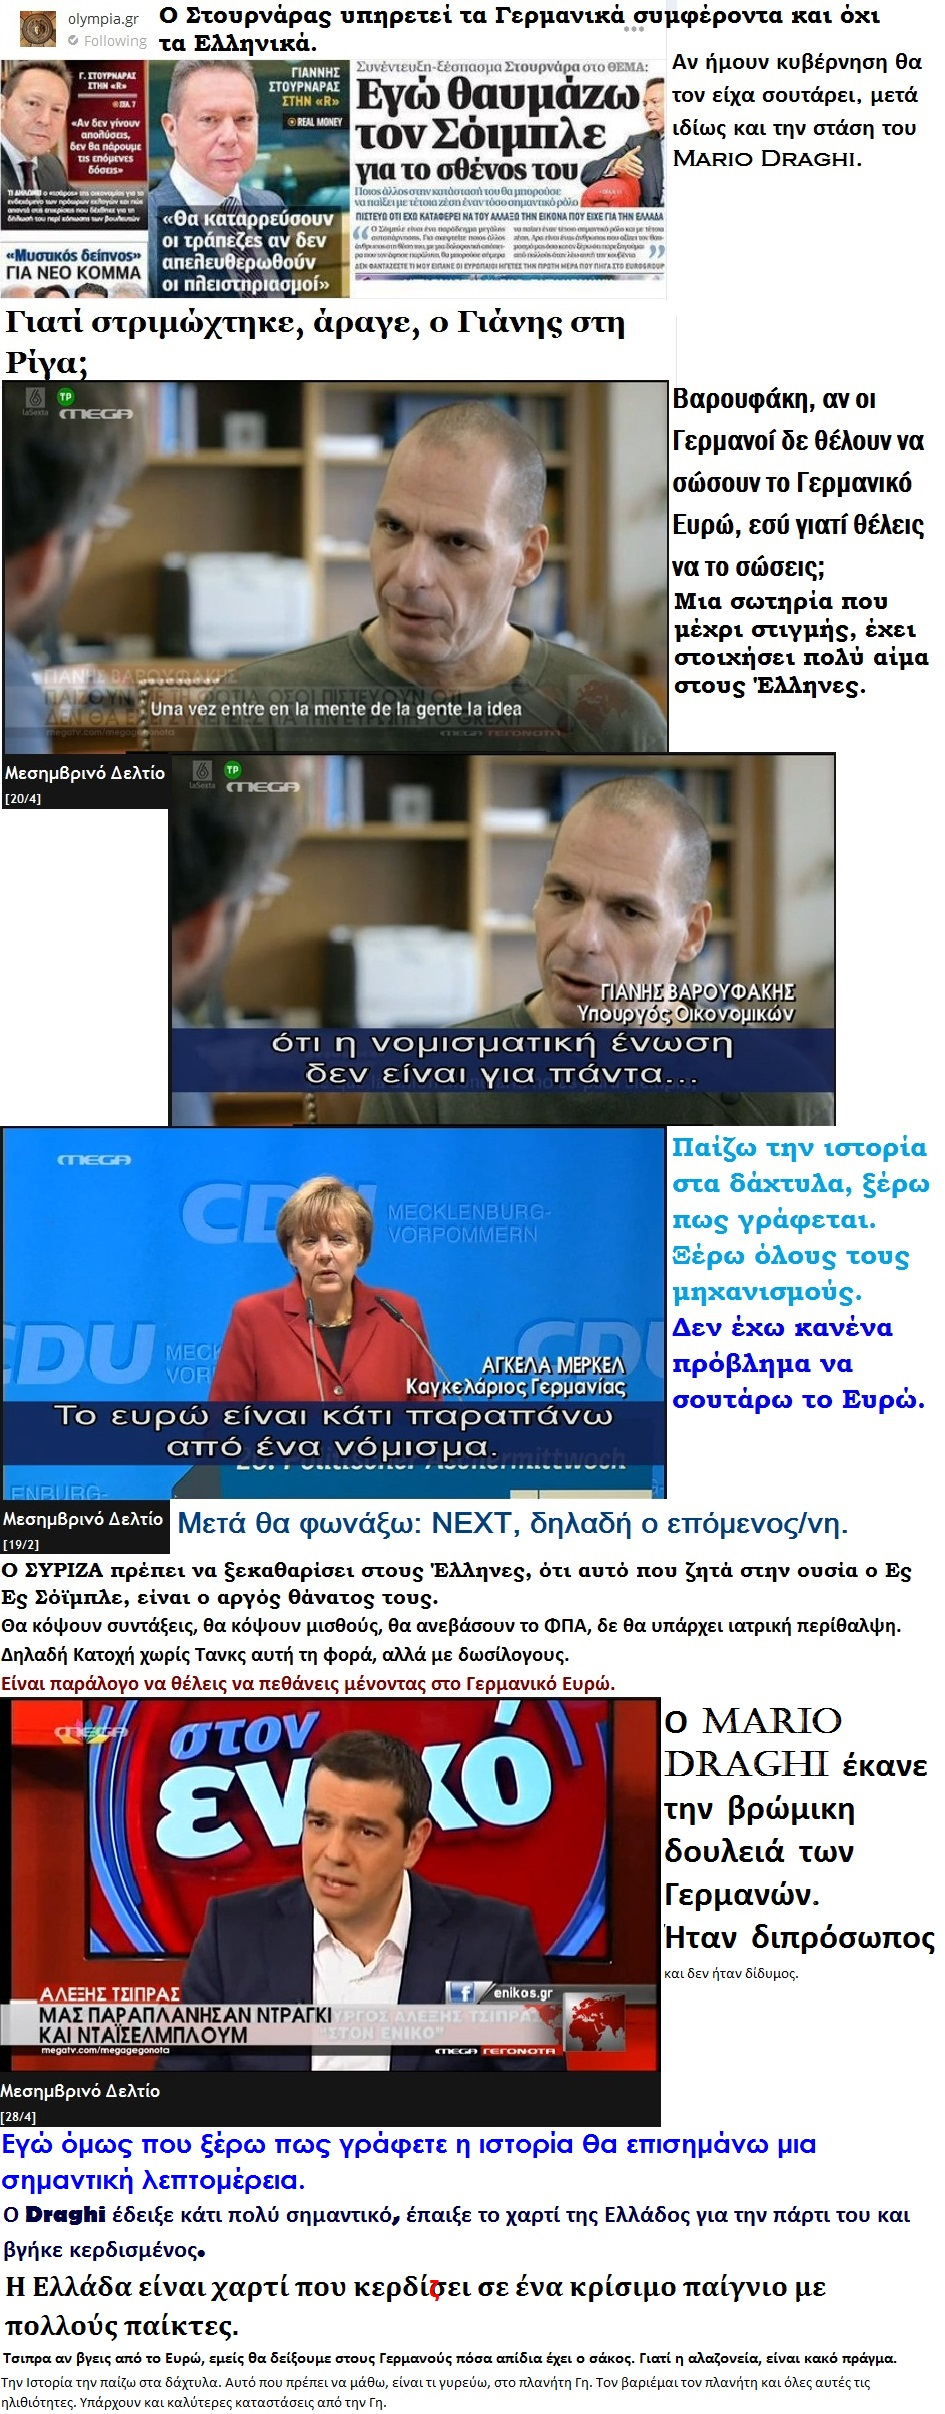 ELLADA TSIPRAS VAROUFAKIS DRAGHI MERKEL EURO 01 290415